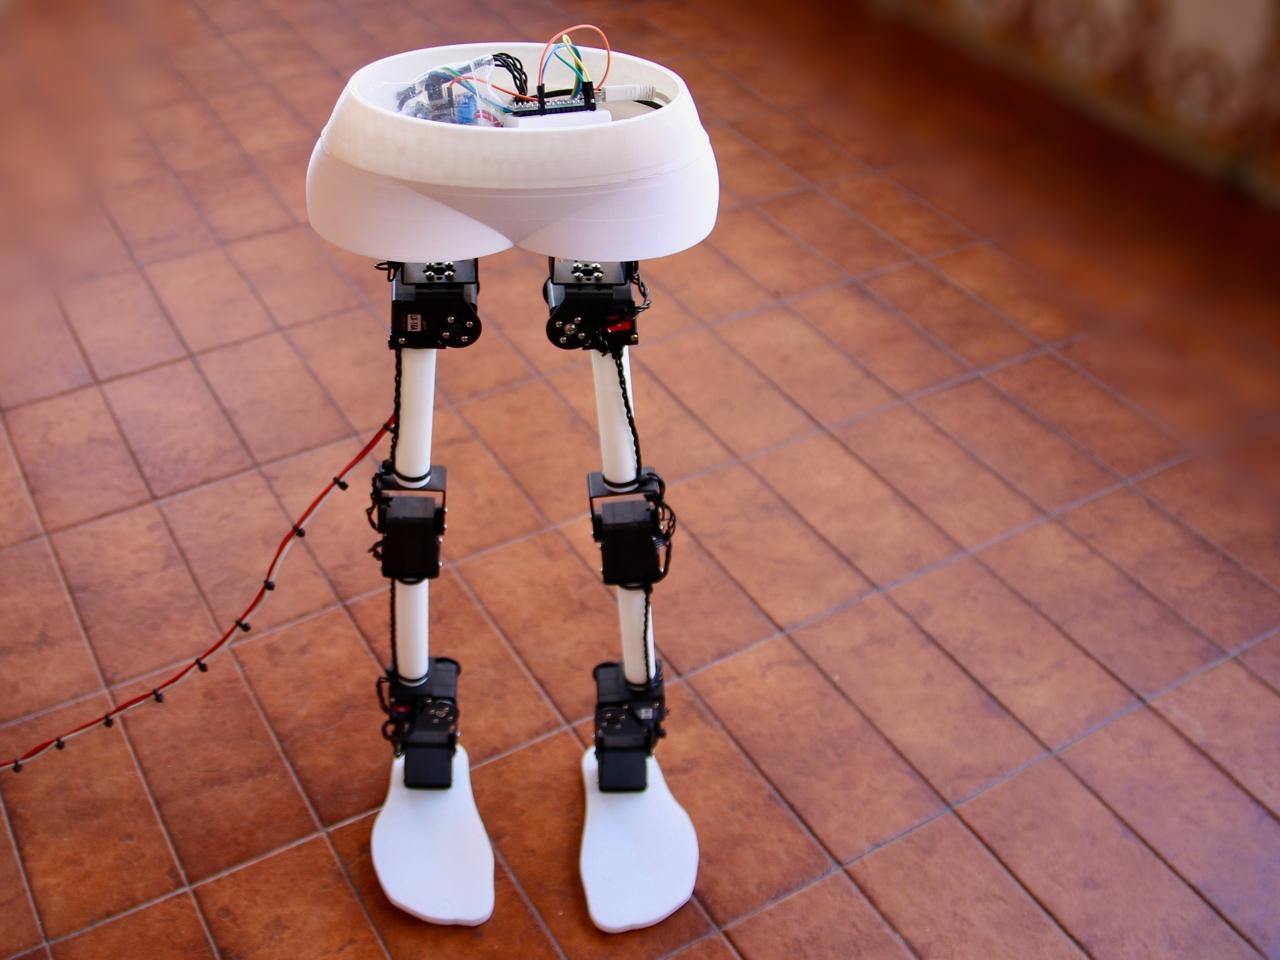 Walbi biped robot